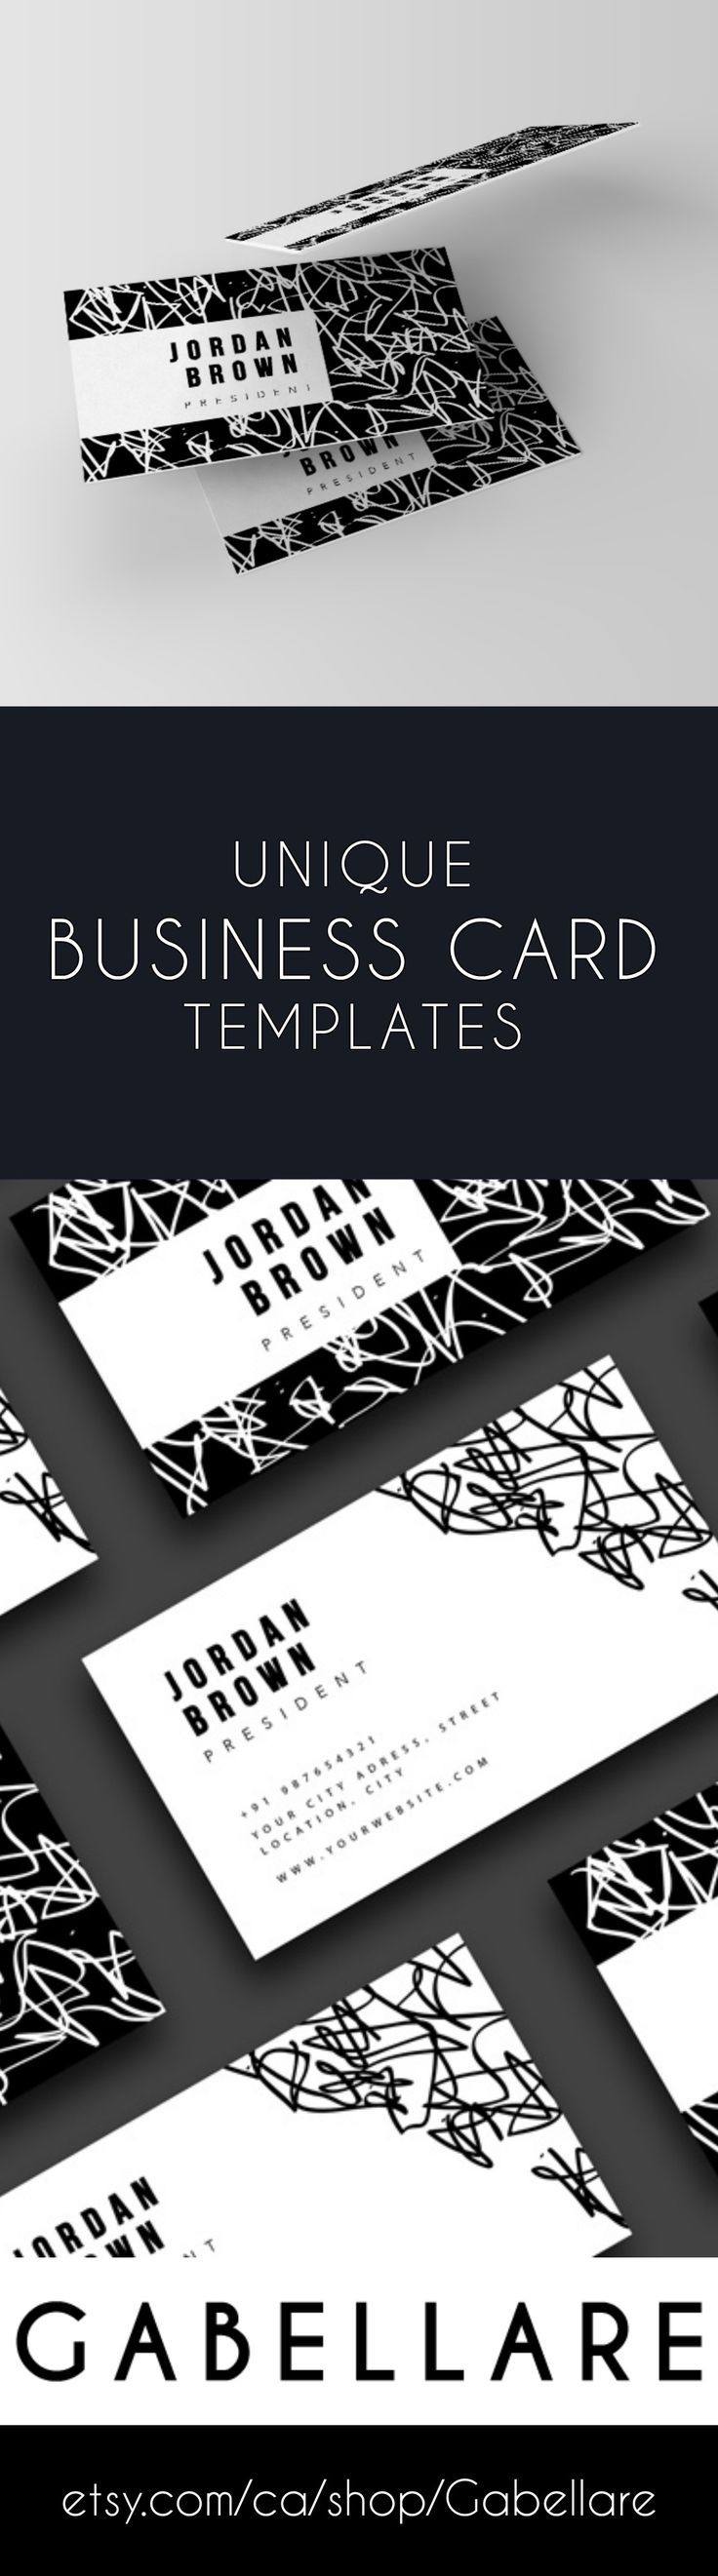 Business Card Design Business Card Template